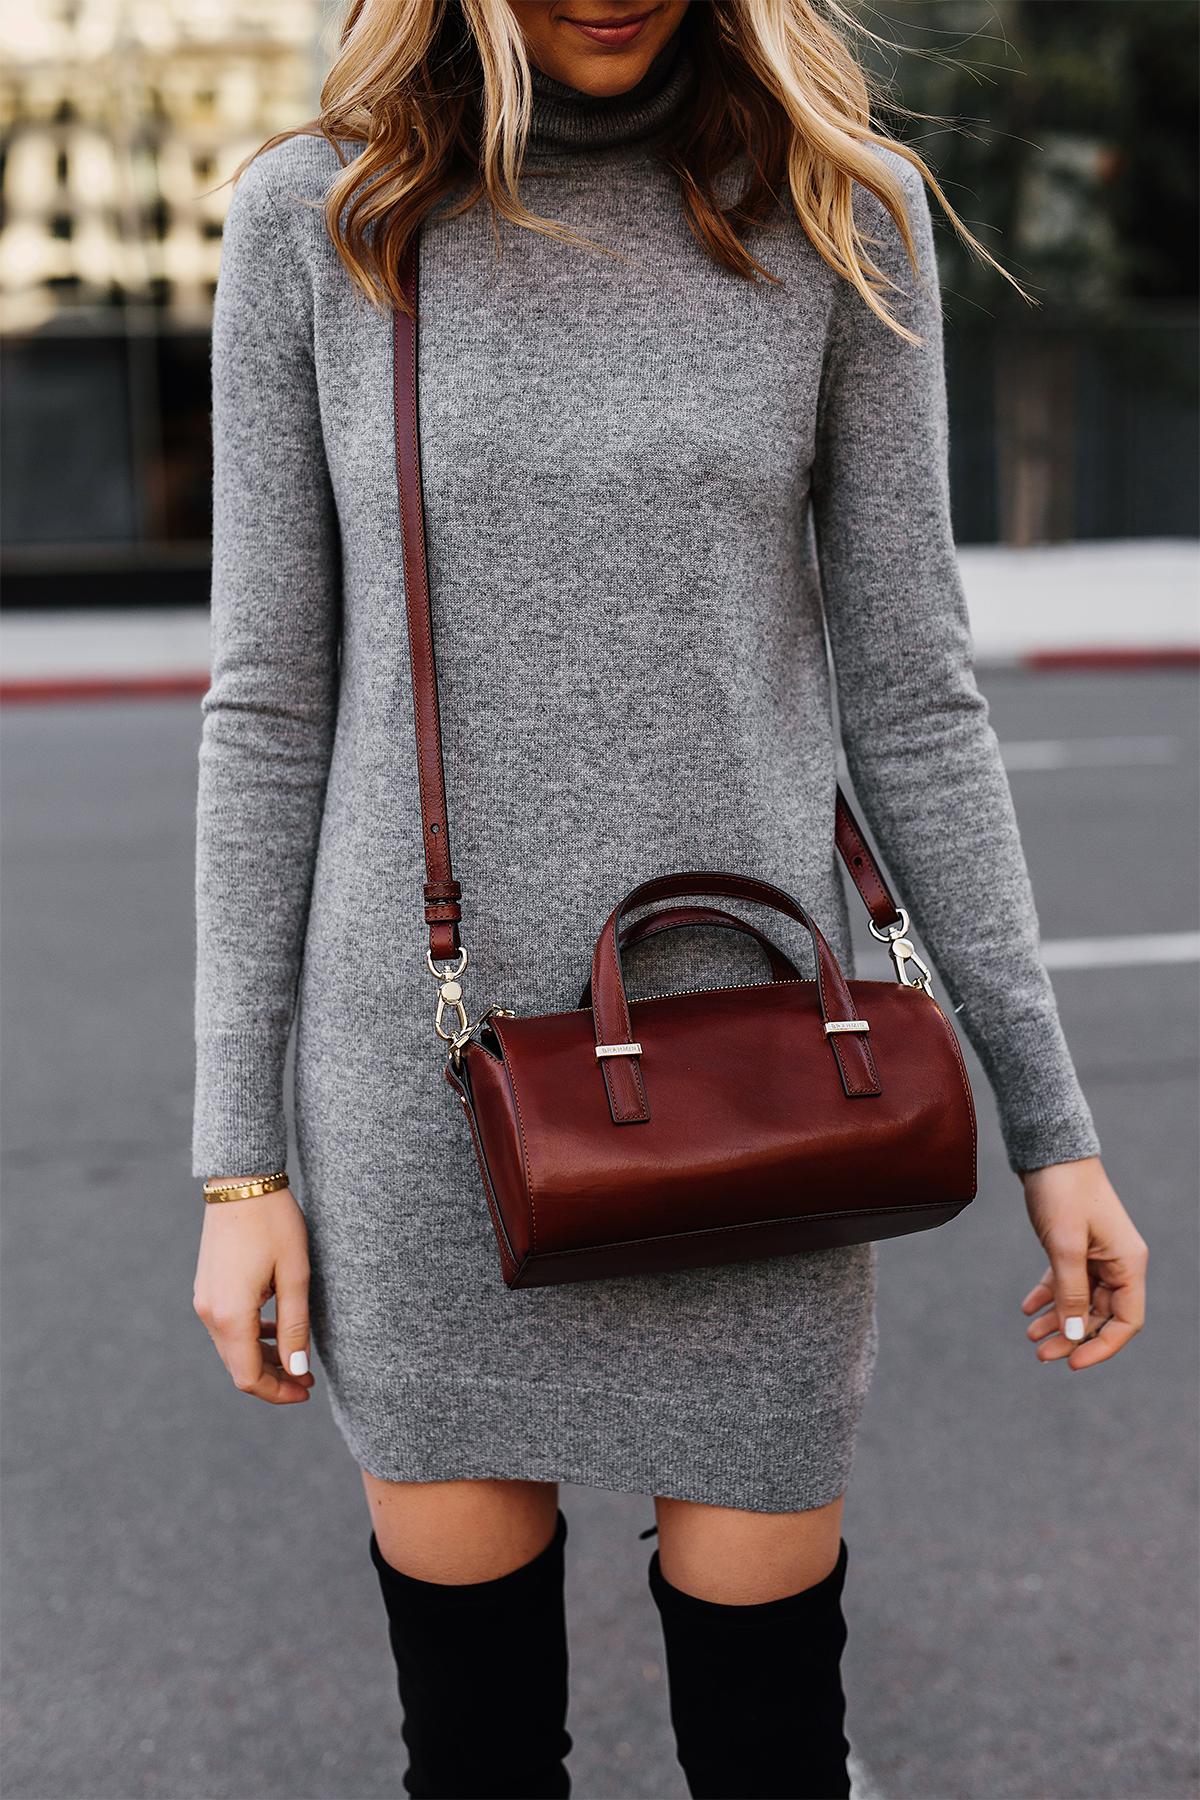 Blonde Woman Wearing Grey Turtleneck Sweater Dress Brahmin Brown Crossbody Fashion Jackson San Diego Fashion Blogger Street Style